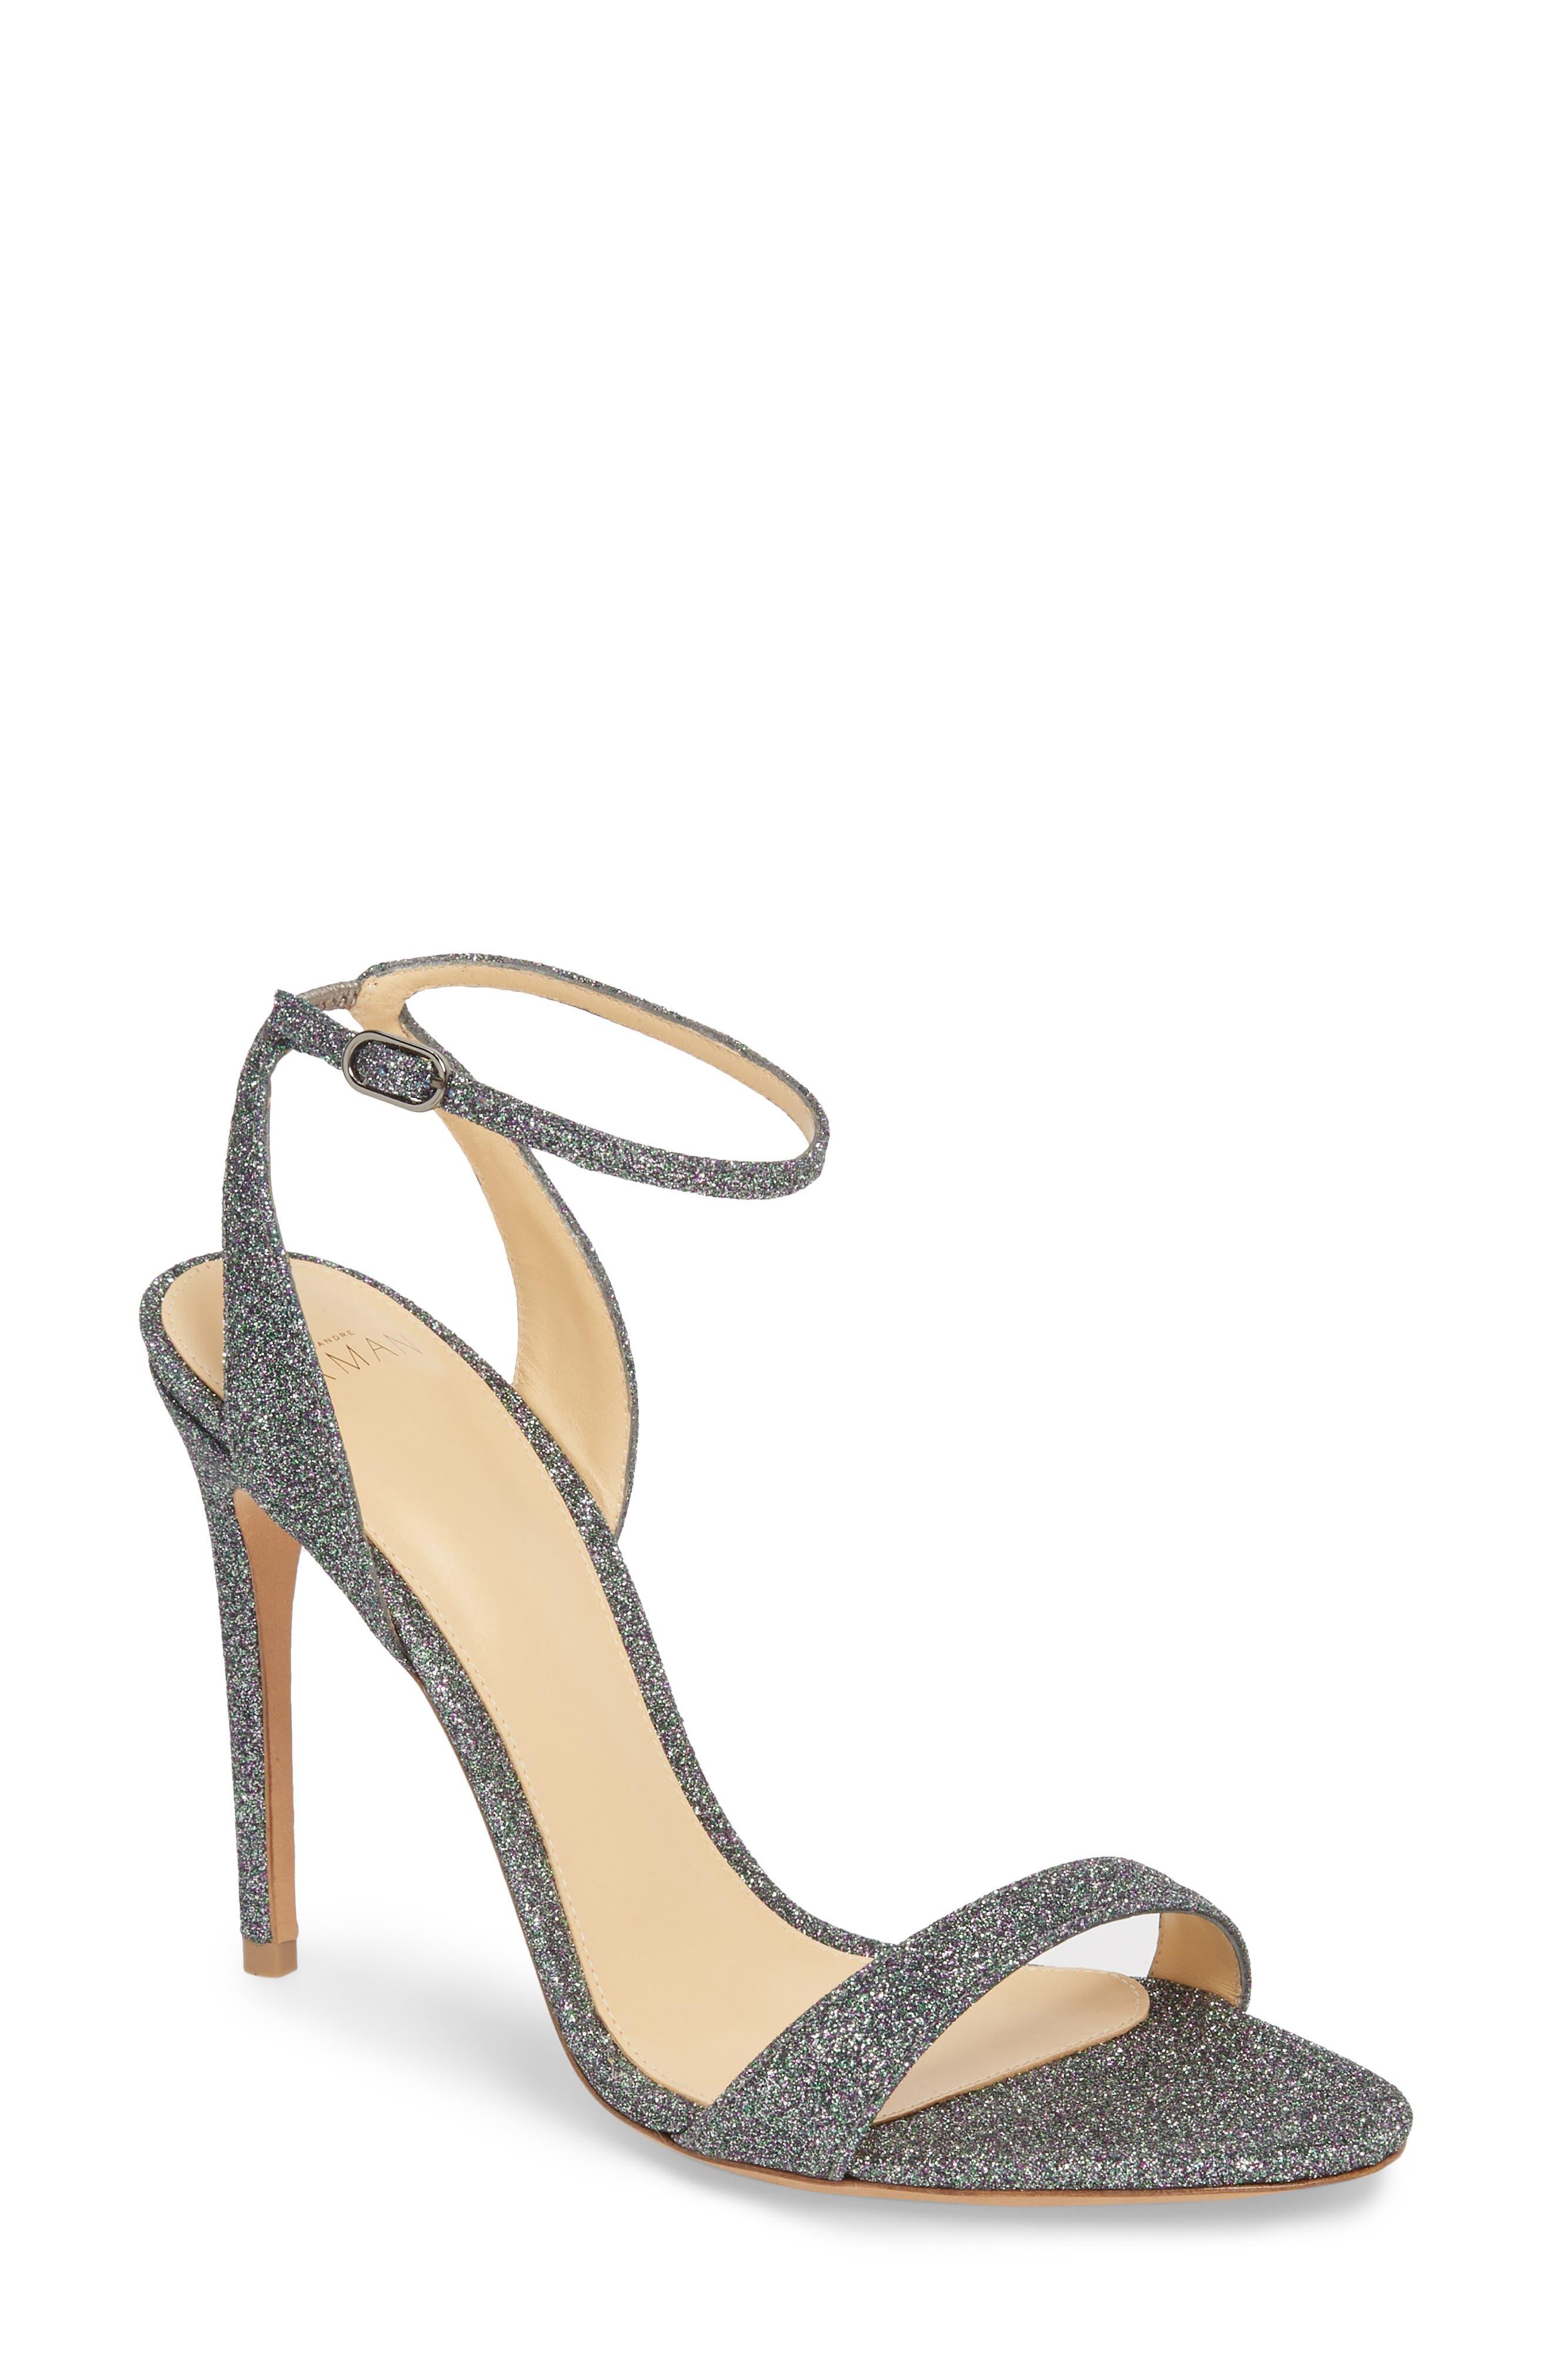 Santine Ankle Strap Sandal,                         Main,                         color, SILVER